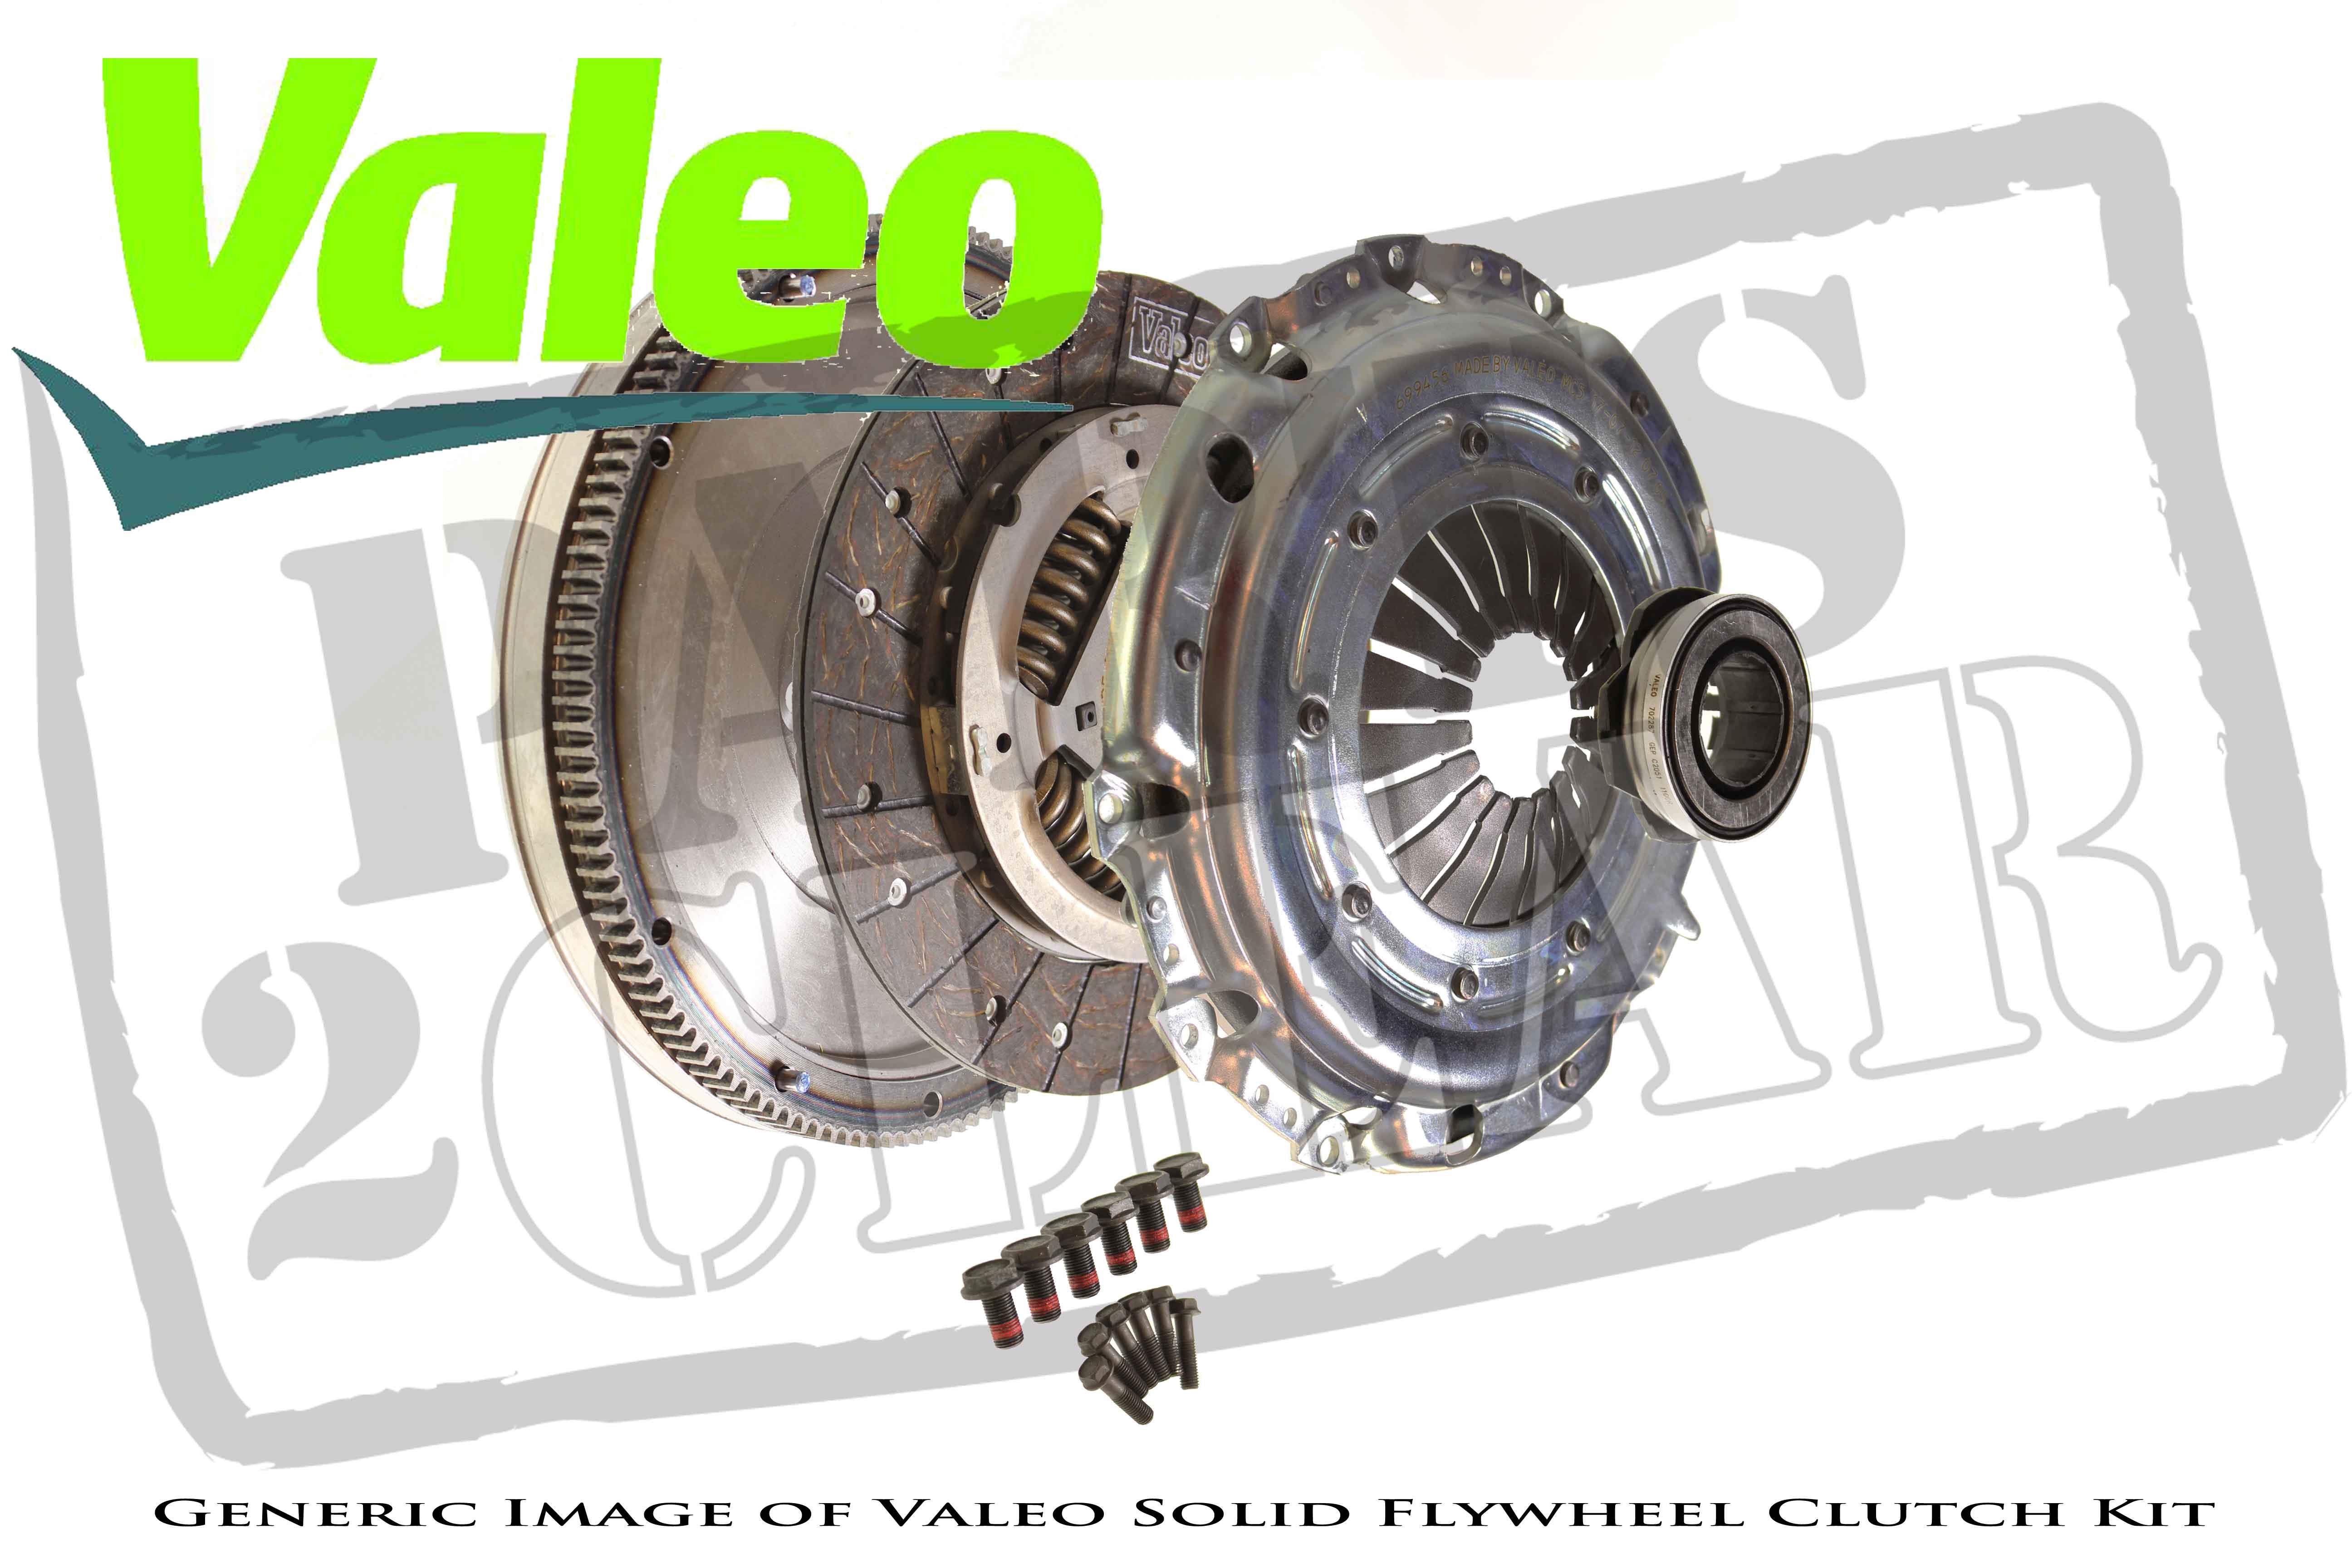 Audi A4 19 Tdi Valeo Dual Mass Replacement Clutch Kit 115 Bke Gya 2004 Only